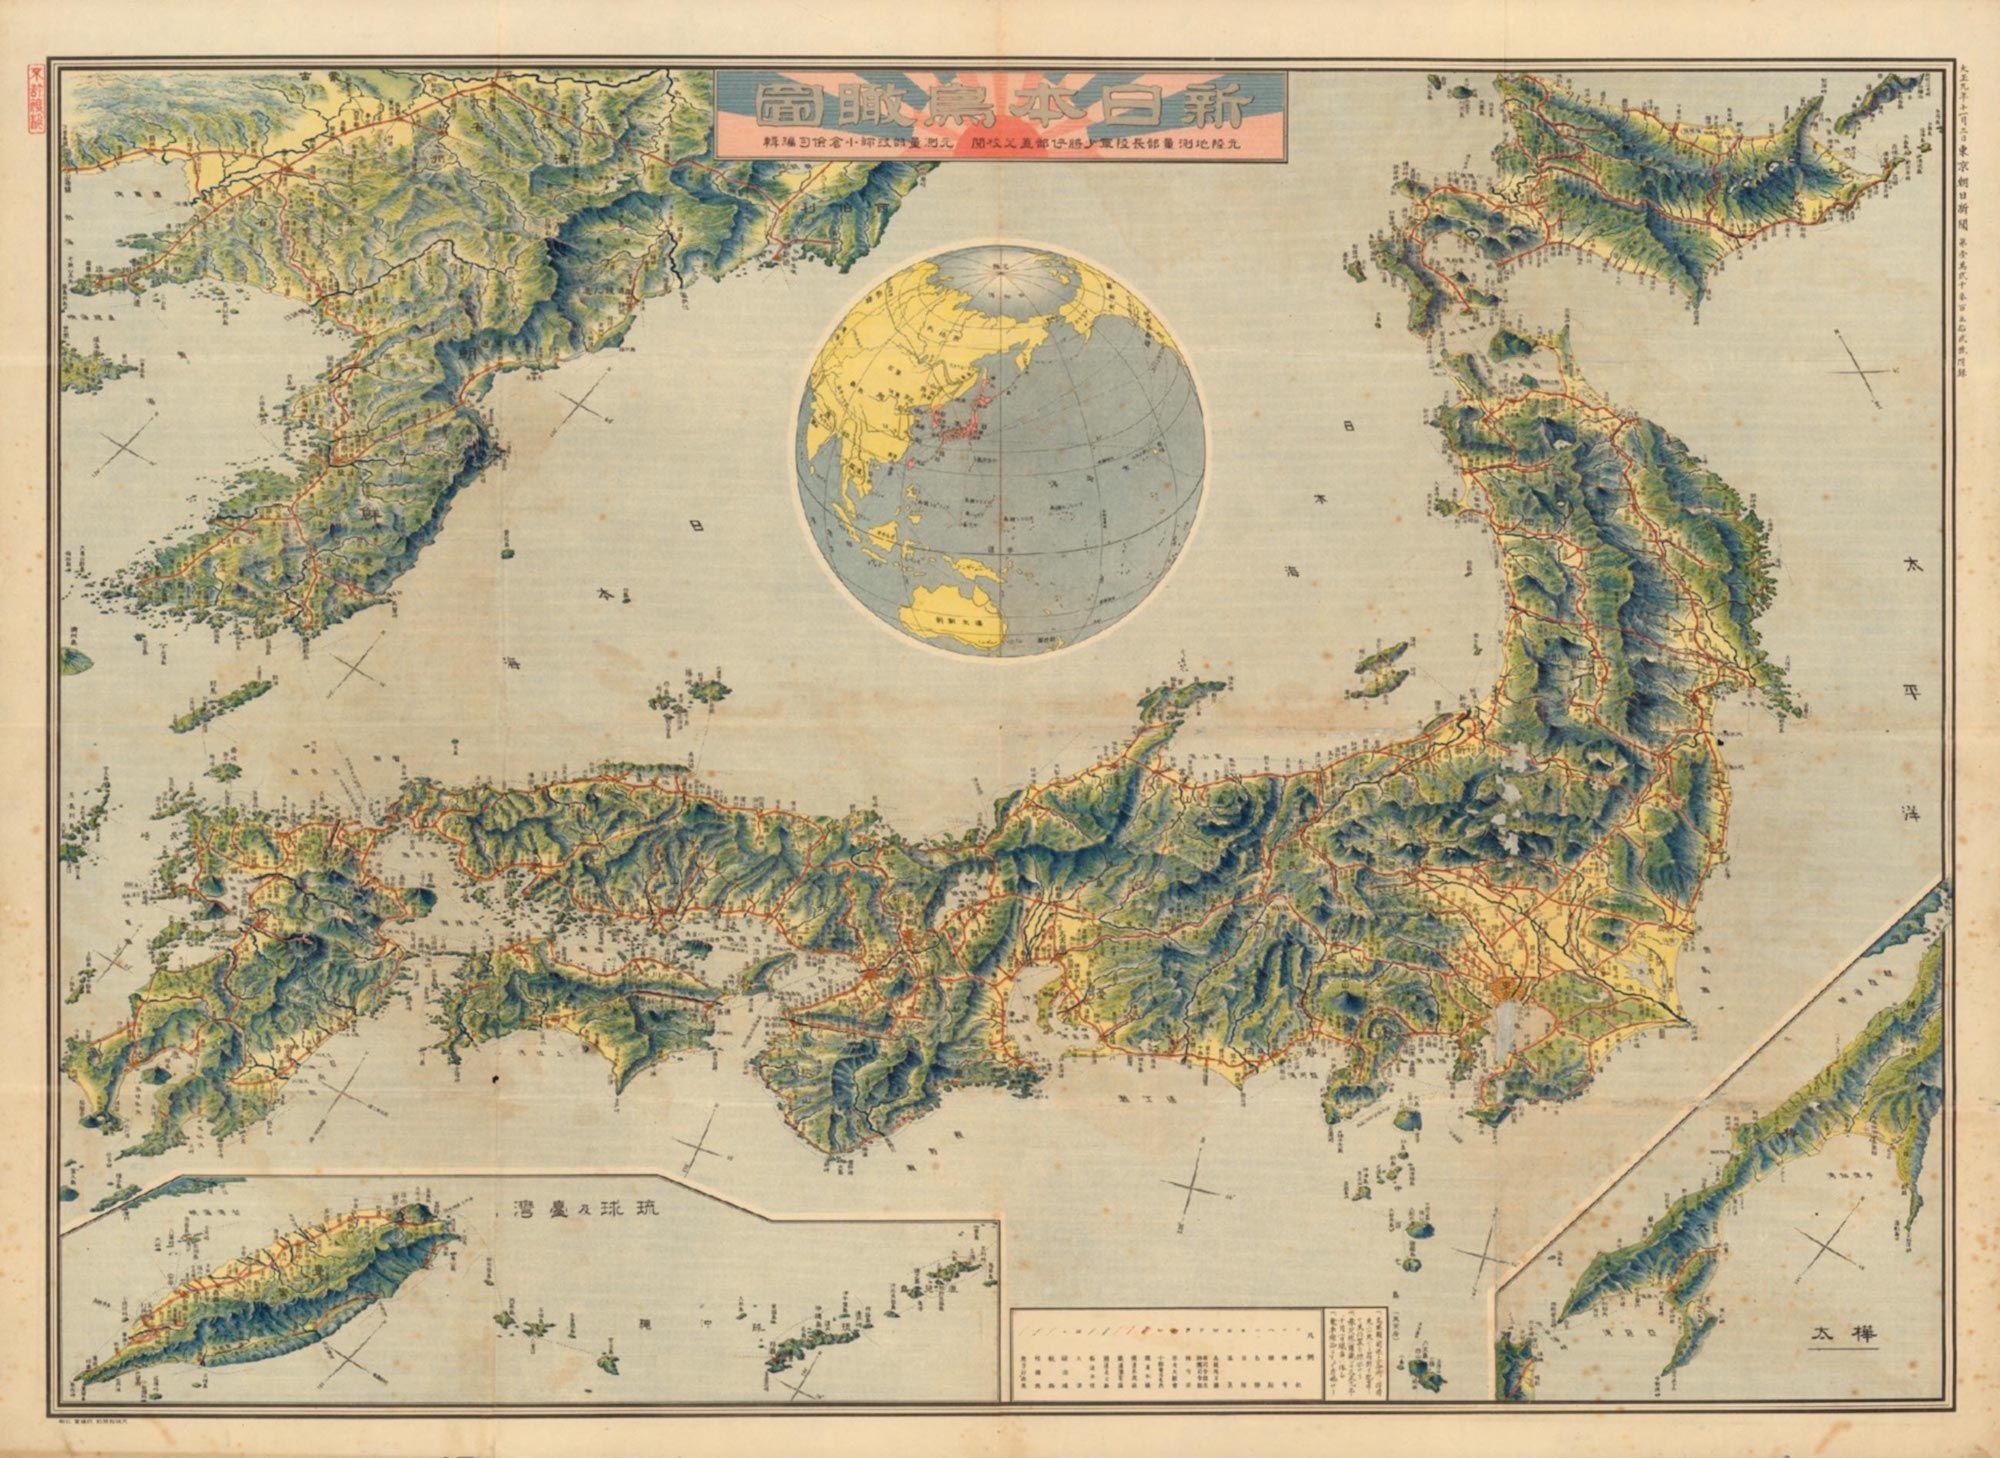 Figura 3: Kenji Ogura, «Veduta a volo d'uccello del nuovo Giappone», Toˉkyoˉ 1921 Asashi Shinbunsha, David Rumsey Historical Map Collection.